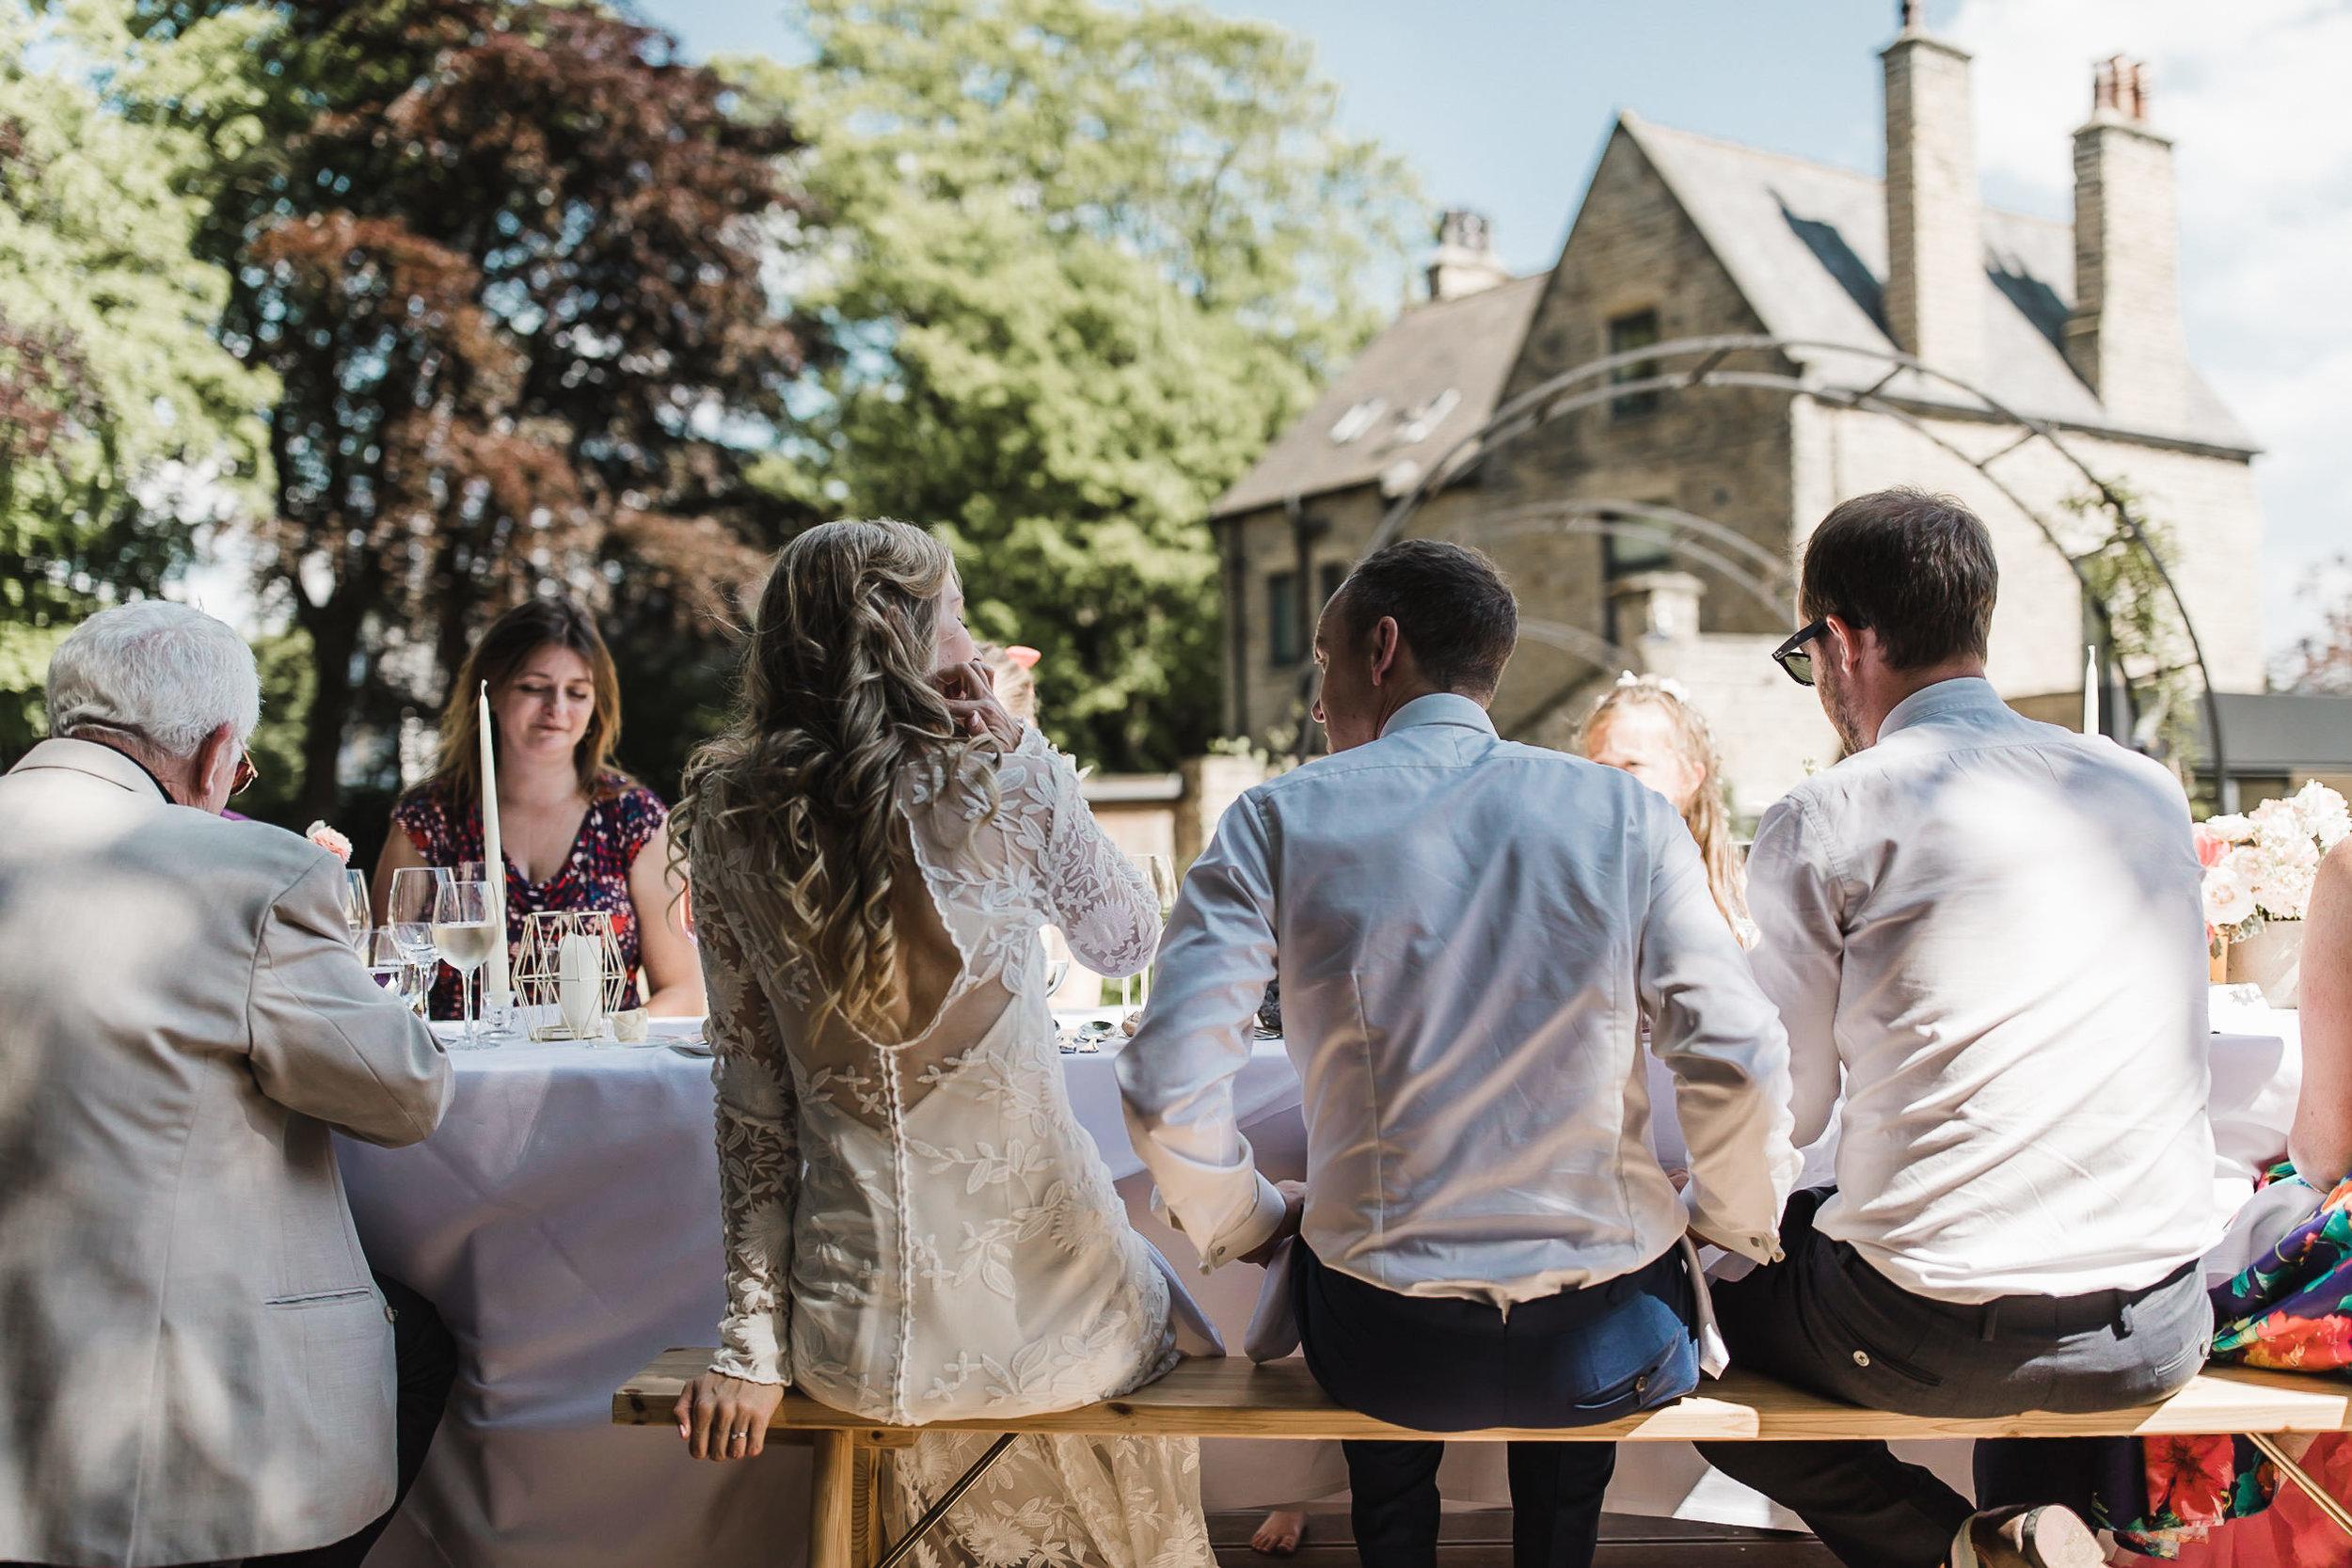 Roundhay-Leeds-Backyard-Wedding-Becs-Chris-138.jpg